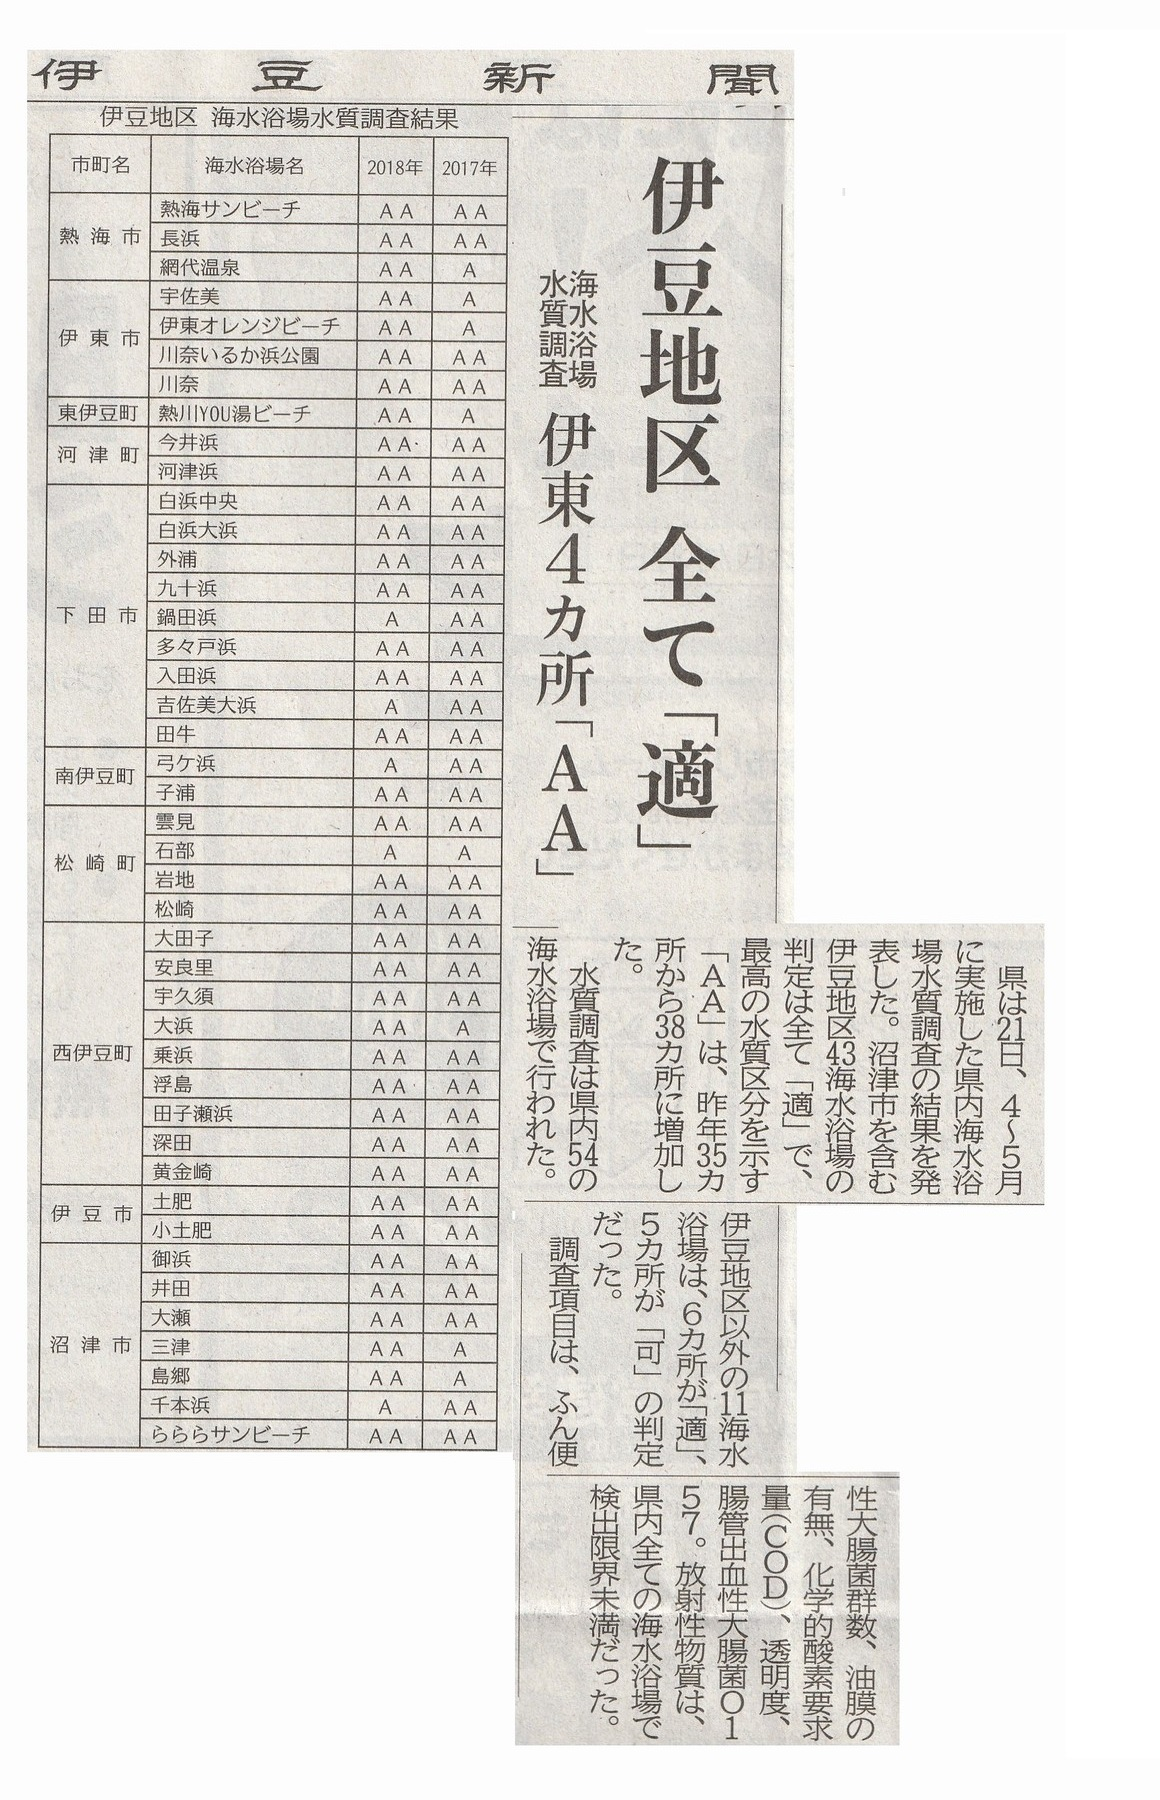 http://magaret.jp/mt_img/%E6%B5%B7%E6%B0%B4%E6%B5%B4%E5%A0%B4%E6%B0%B4%E8%B3%AA%E8%AA%BF%E6%9F%BB_JALAN_180621.jpg